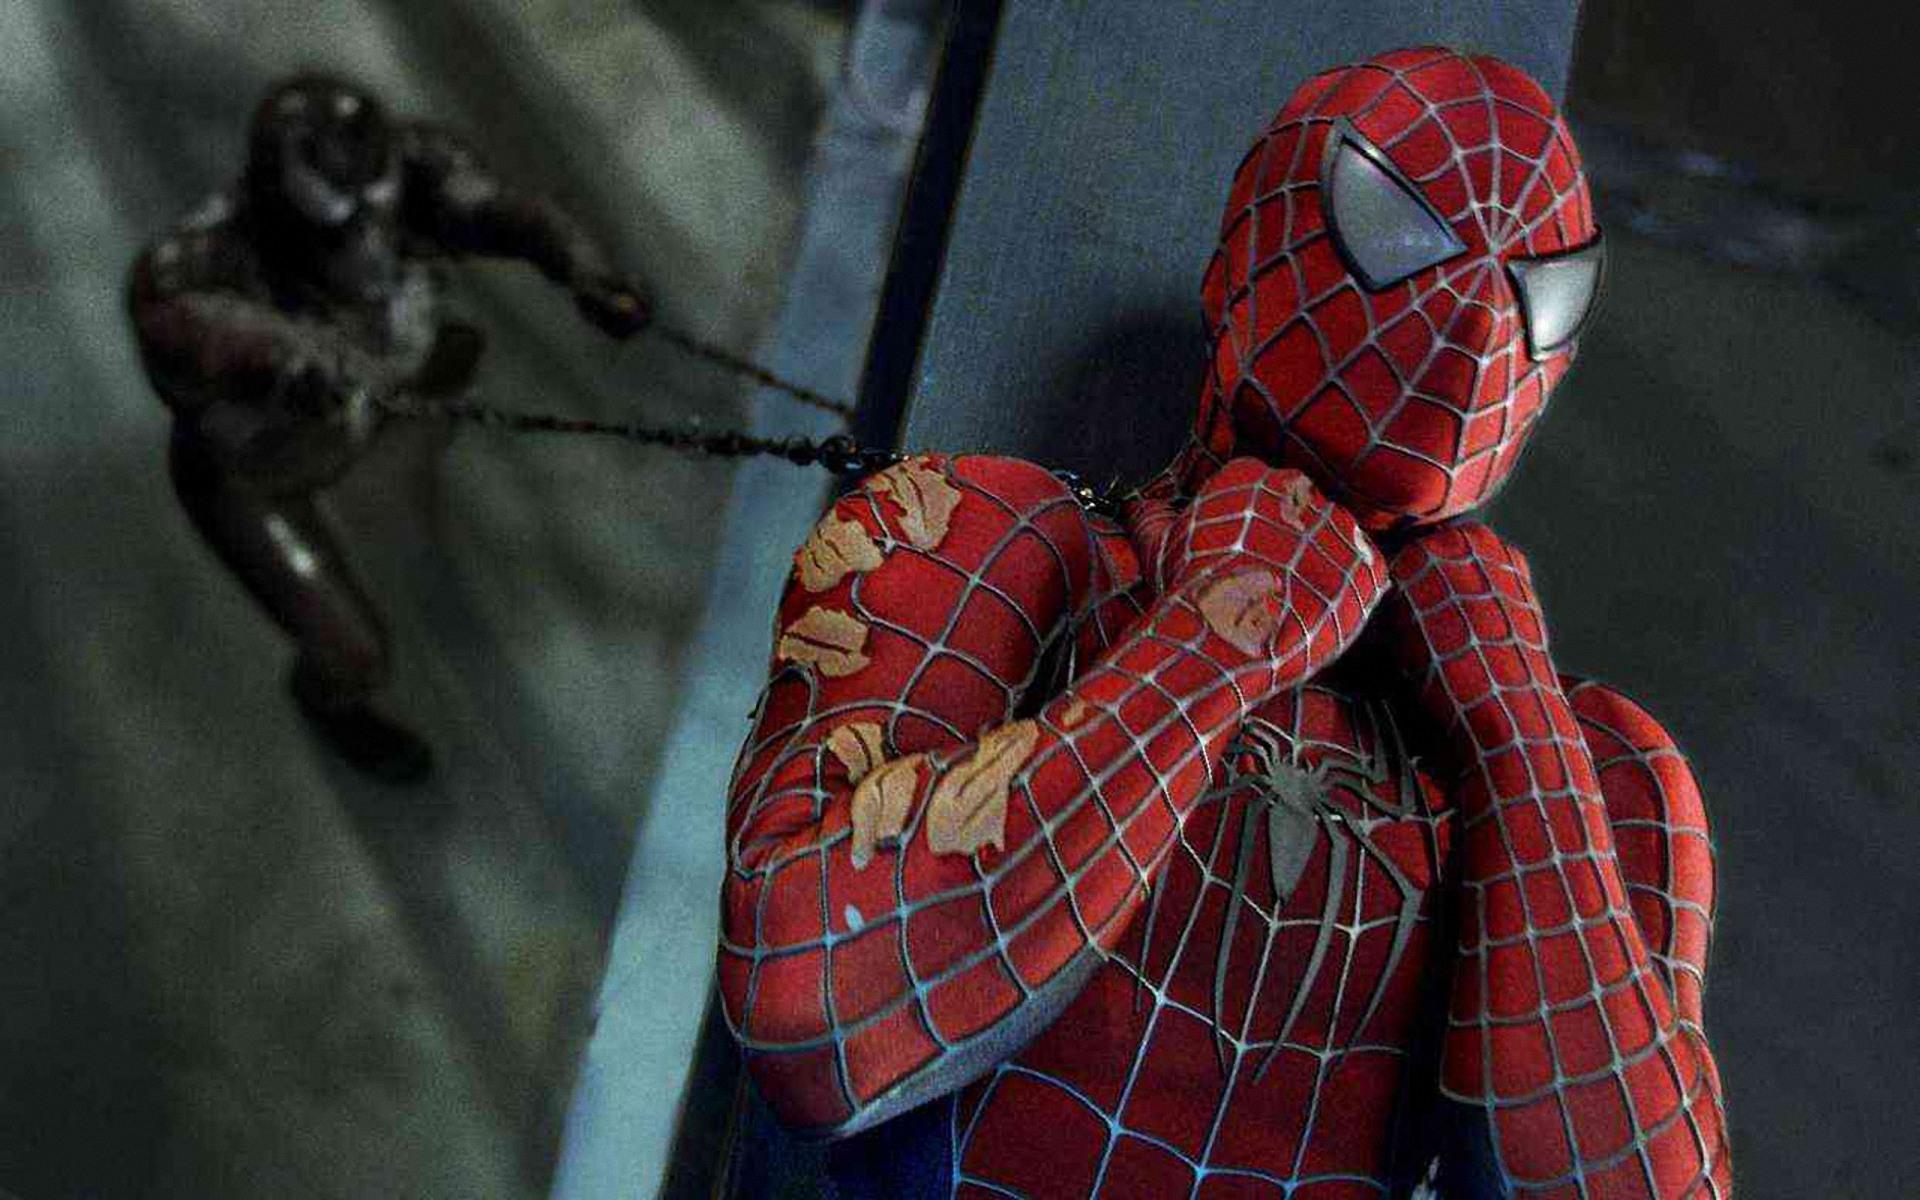 Marvel Spider-Man 3 MovieSpoon.com